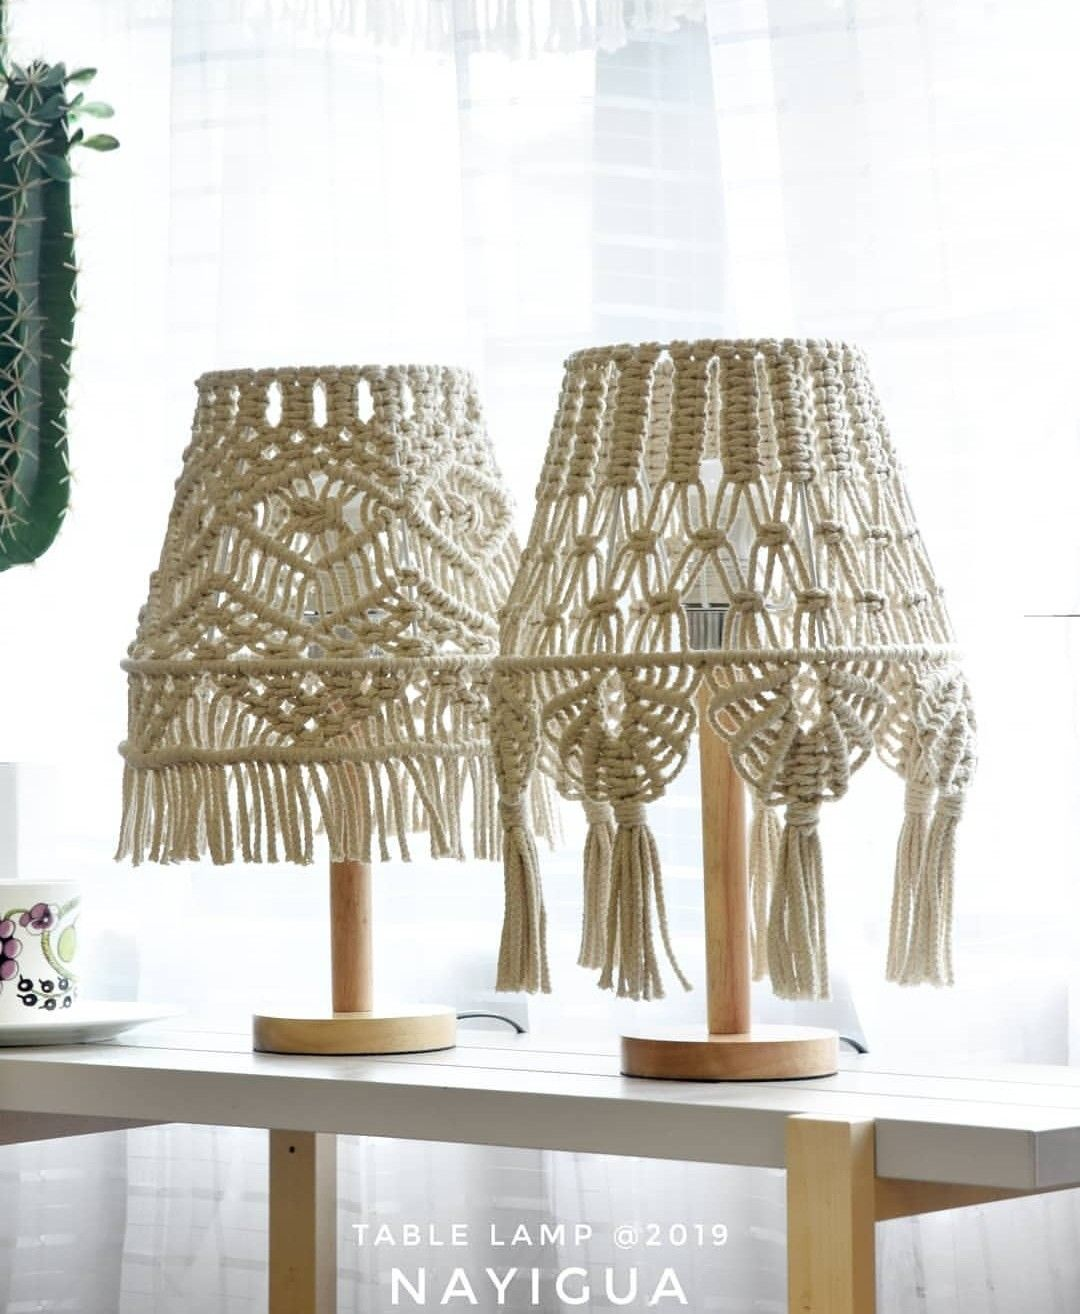 Pin By Barbara Bongiovanni On Macrame In 2020 Macrame Furniture Macrame Design Macrame Wall Hanging Diy